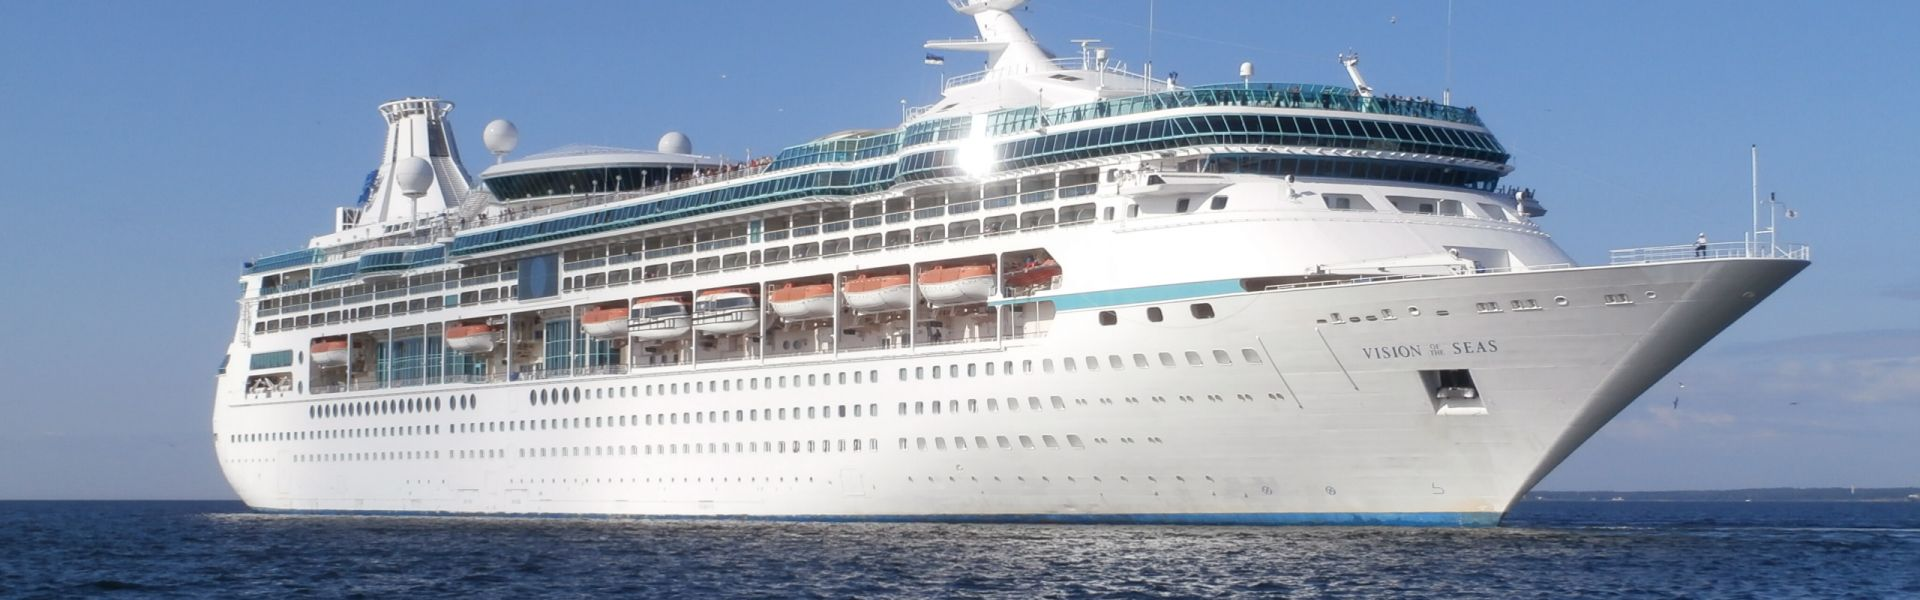 Croaziera 2016 - Emiratele Arabe Unite (Dubai) - Royal Caribbean Cruise Line - Vision of the Seas - 7 nopti - ZBOR INCLUS